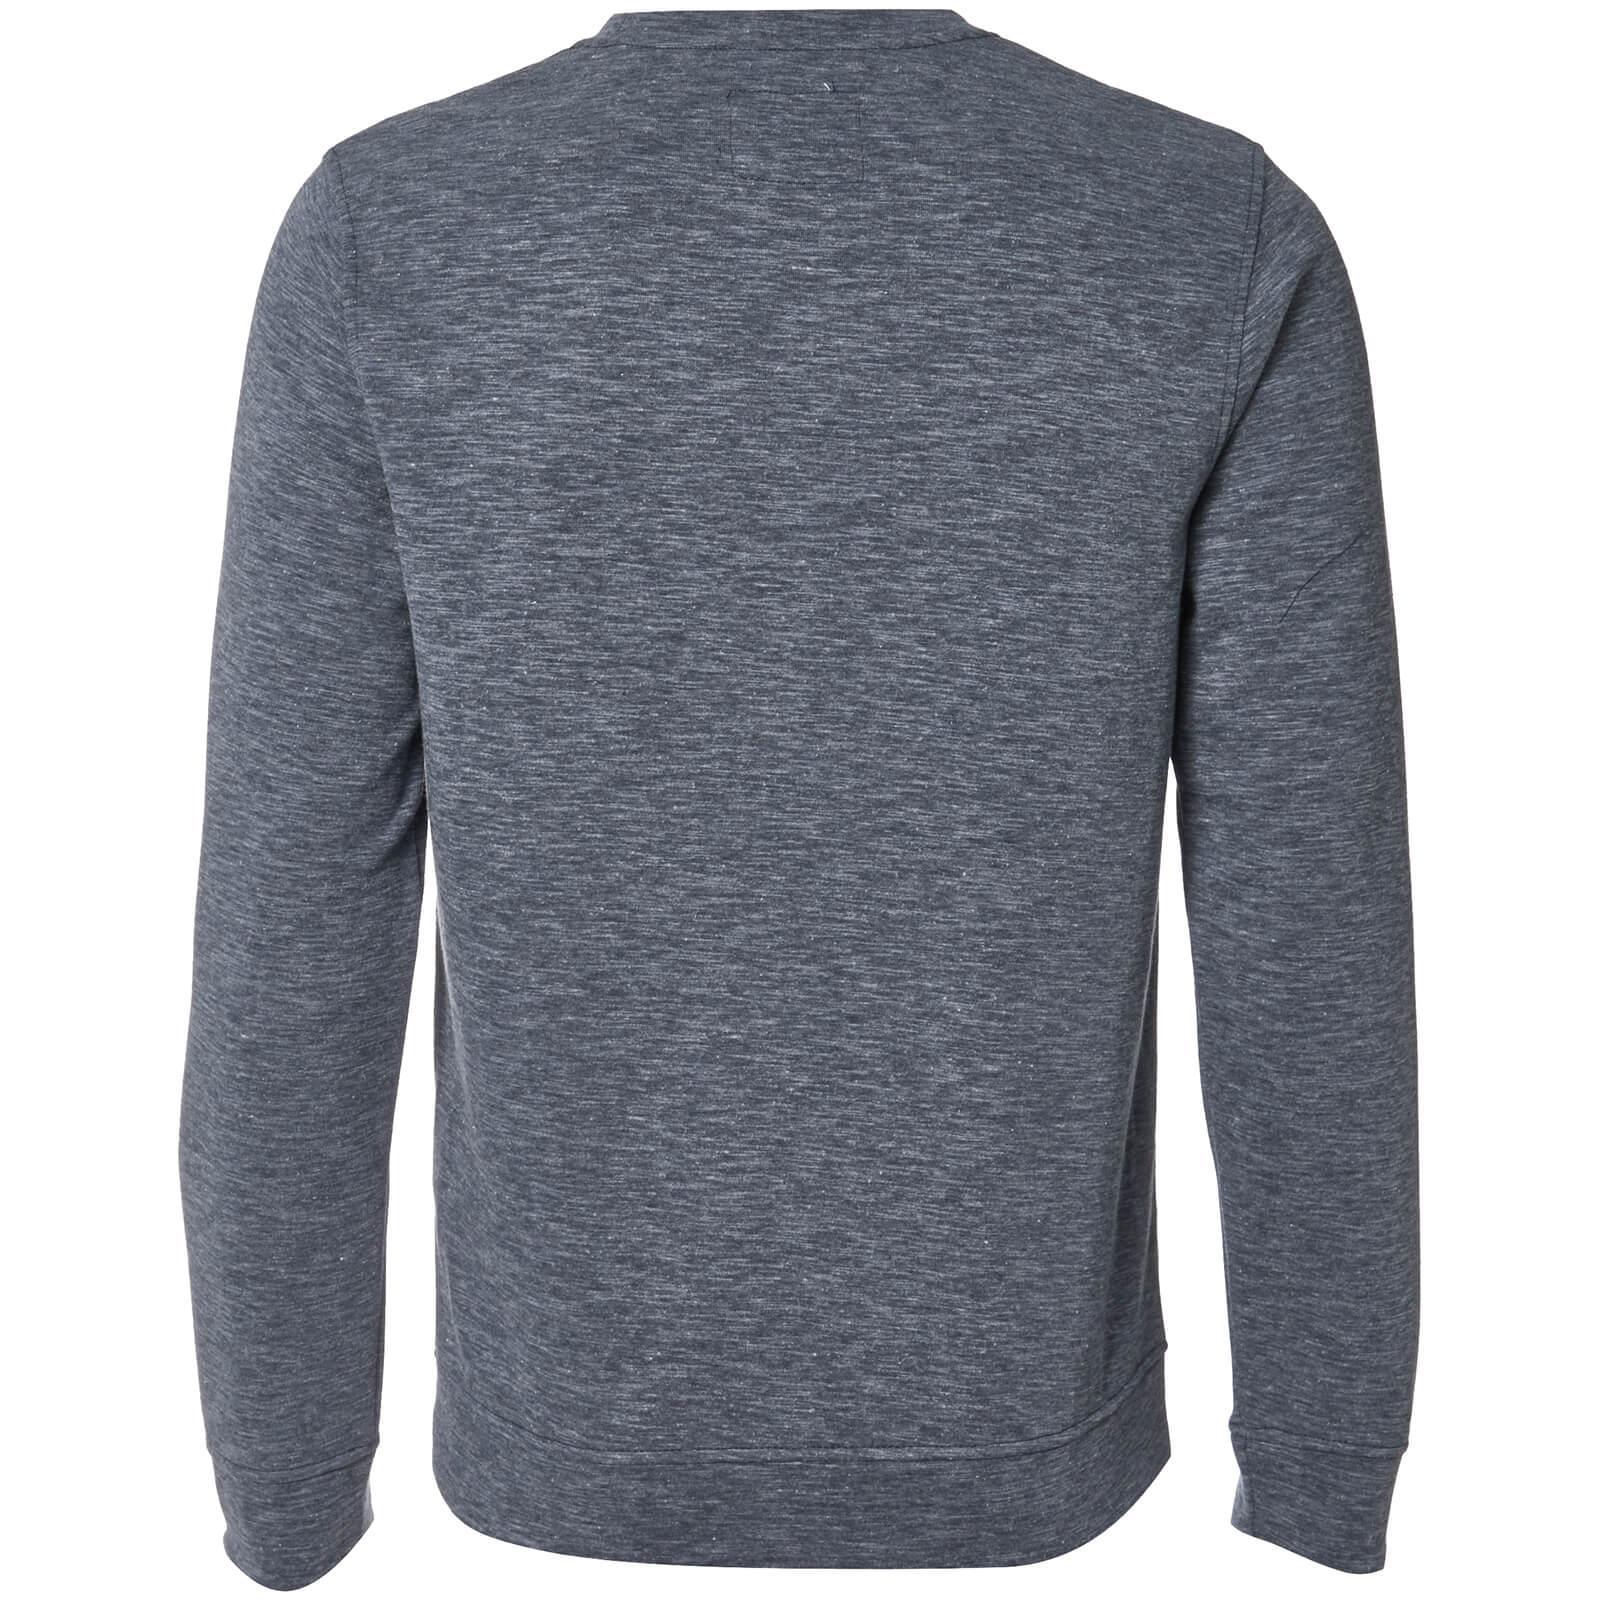 Jack & Jones Cotton Core Pase Sweatshirt in Blue for Men